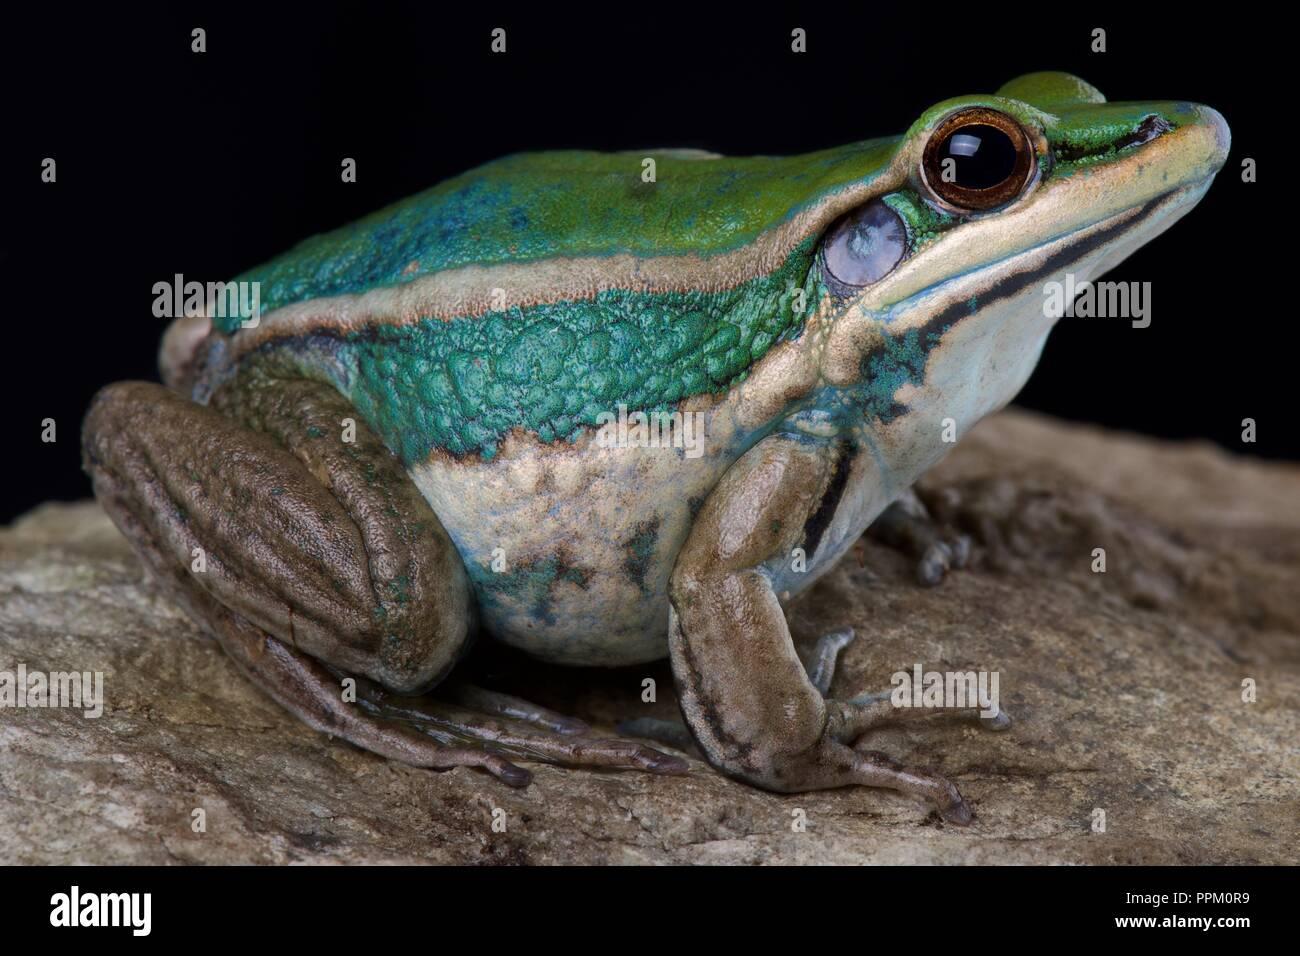 Common green frog (Hylarana erythraea) - Stock Image